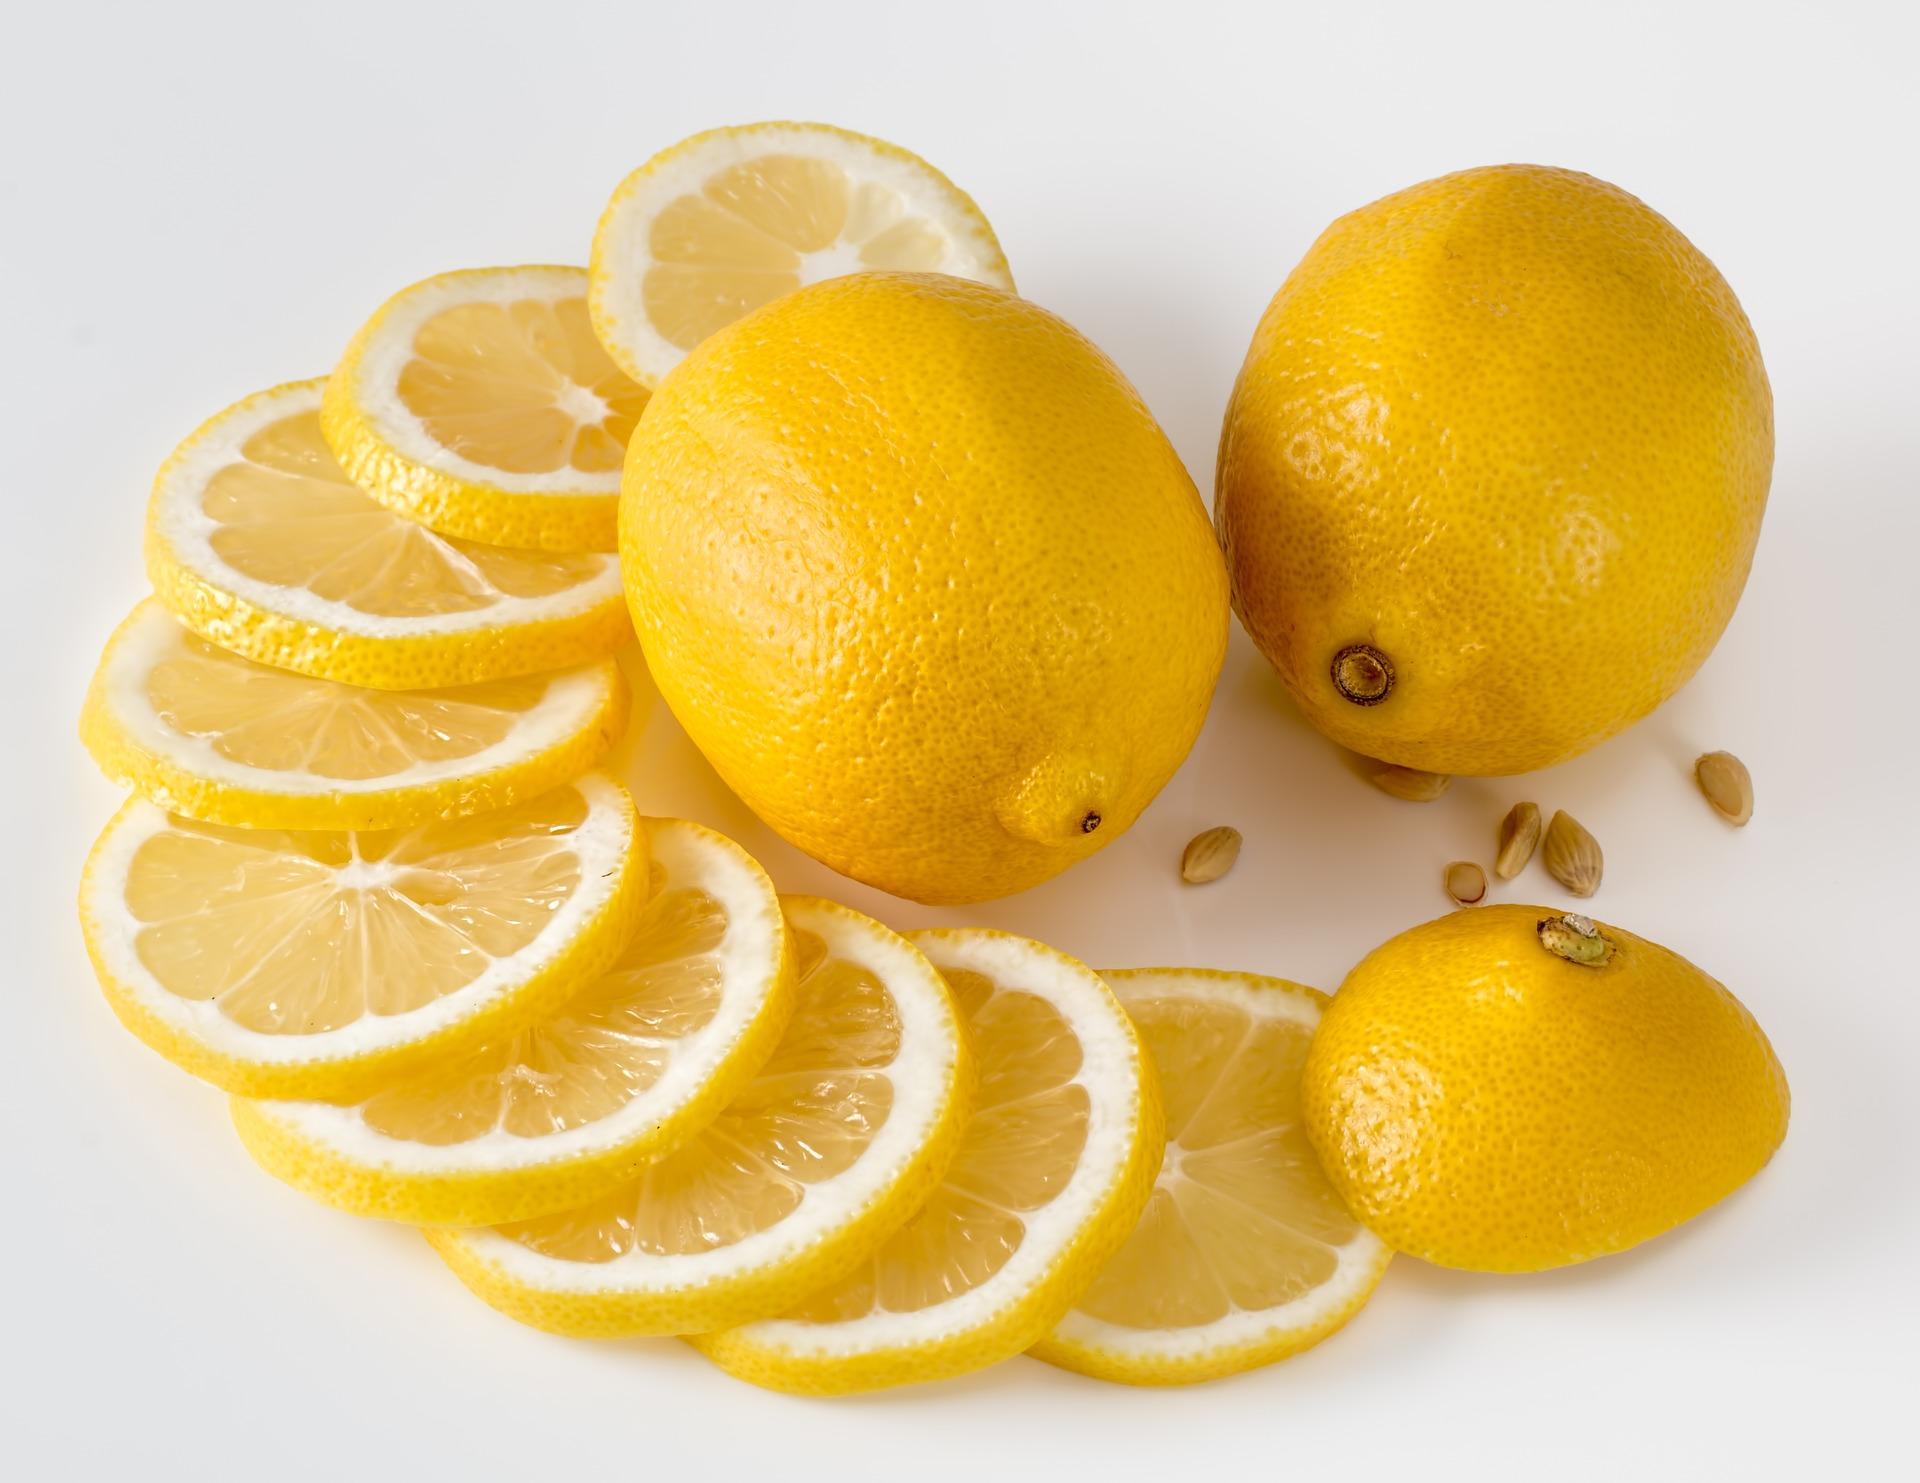 lemon-3225459_1920